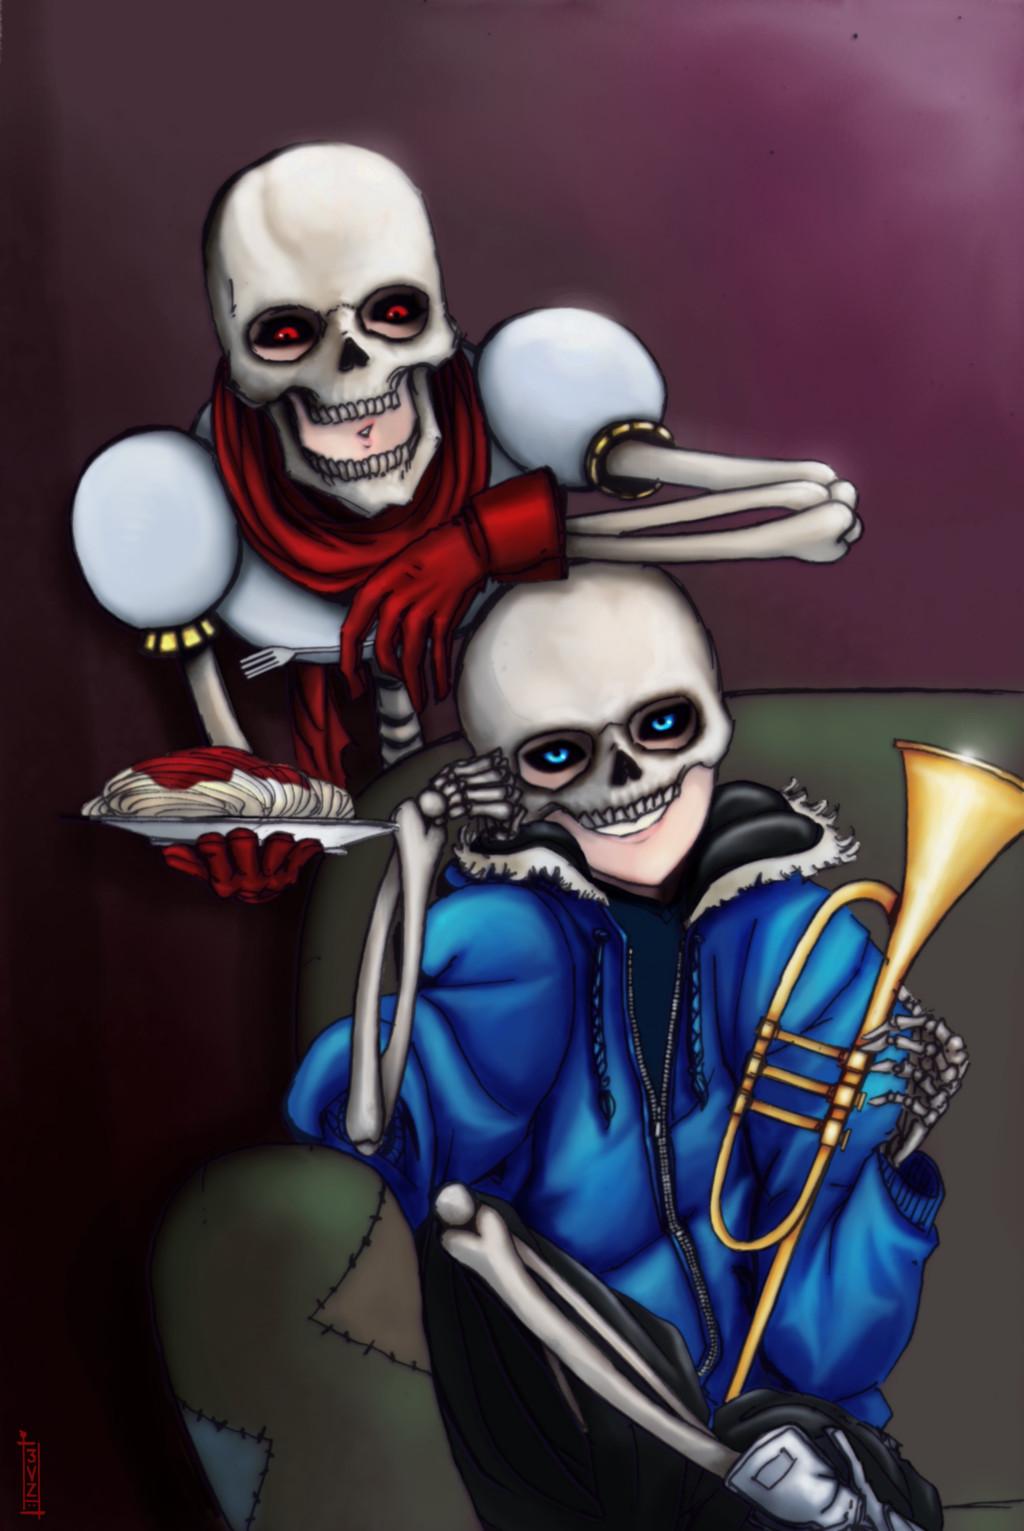 Картинки скелета санса, анимации пятницей поздравления